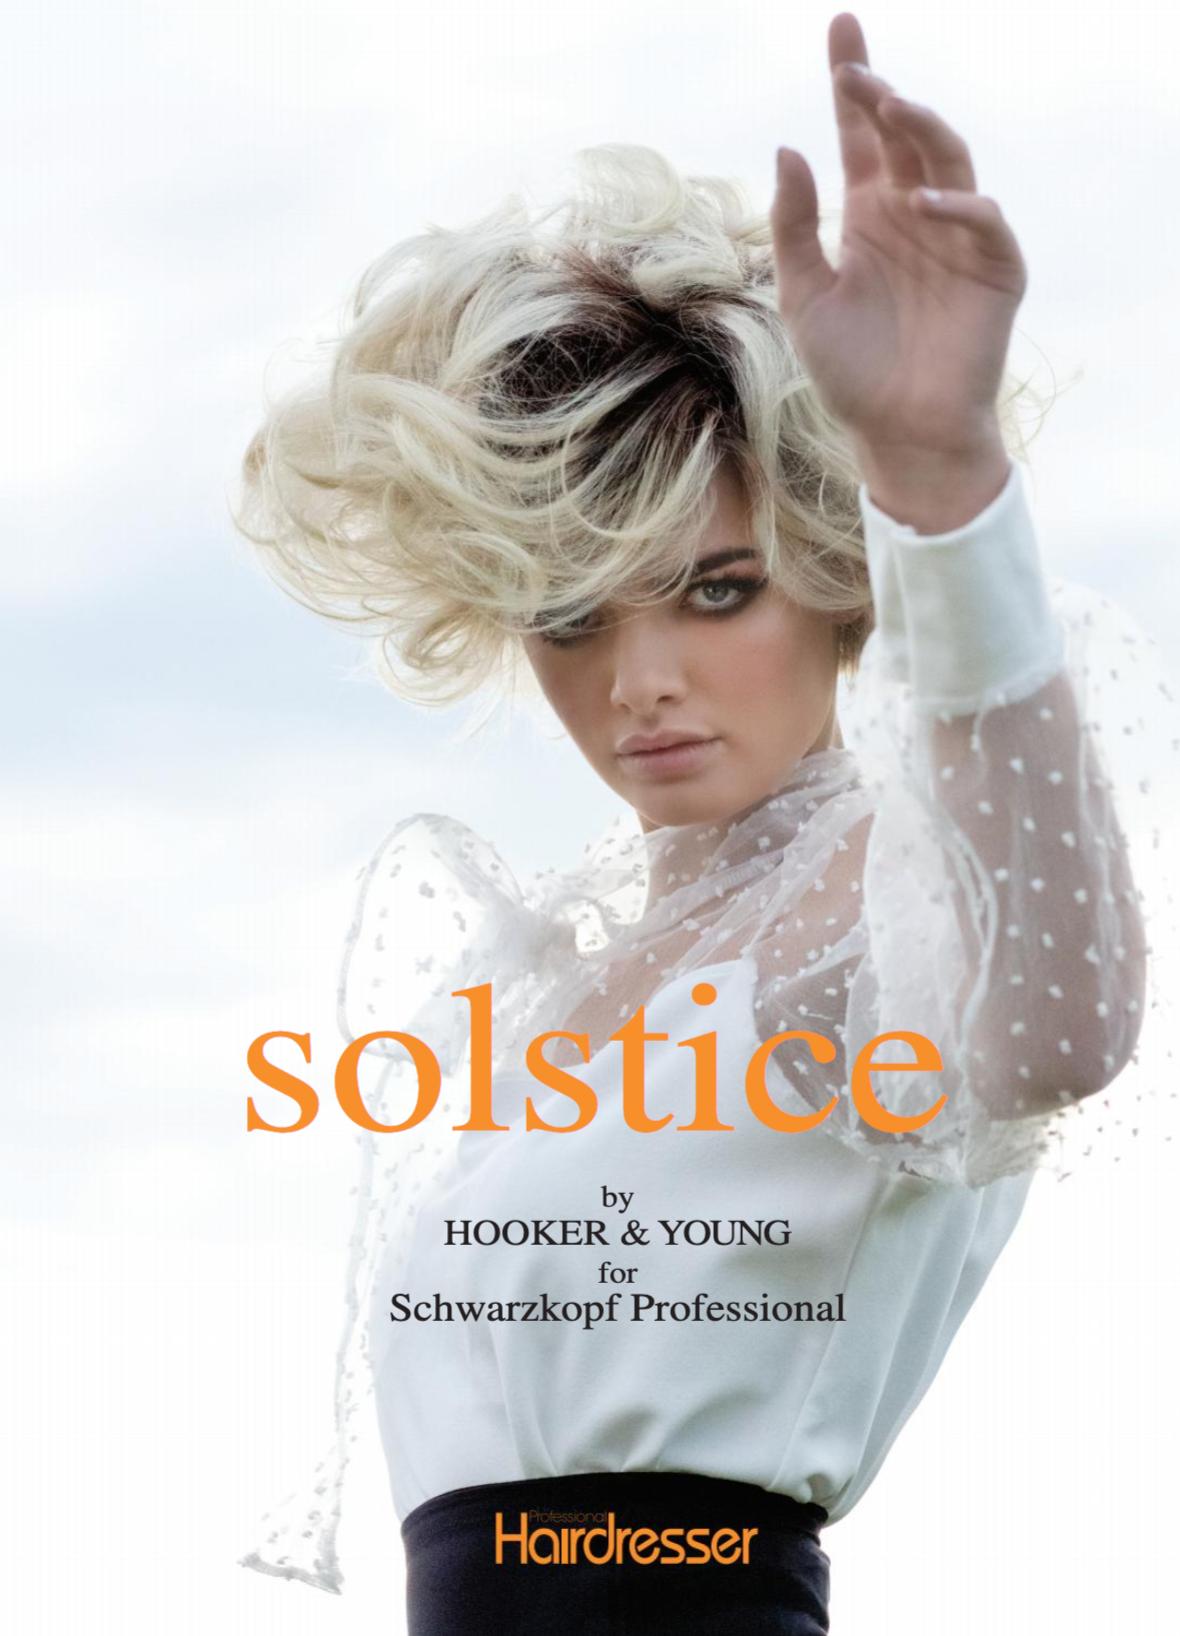 Solstice | Hooker & Young Supplement September 2020